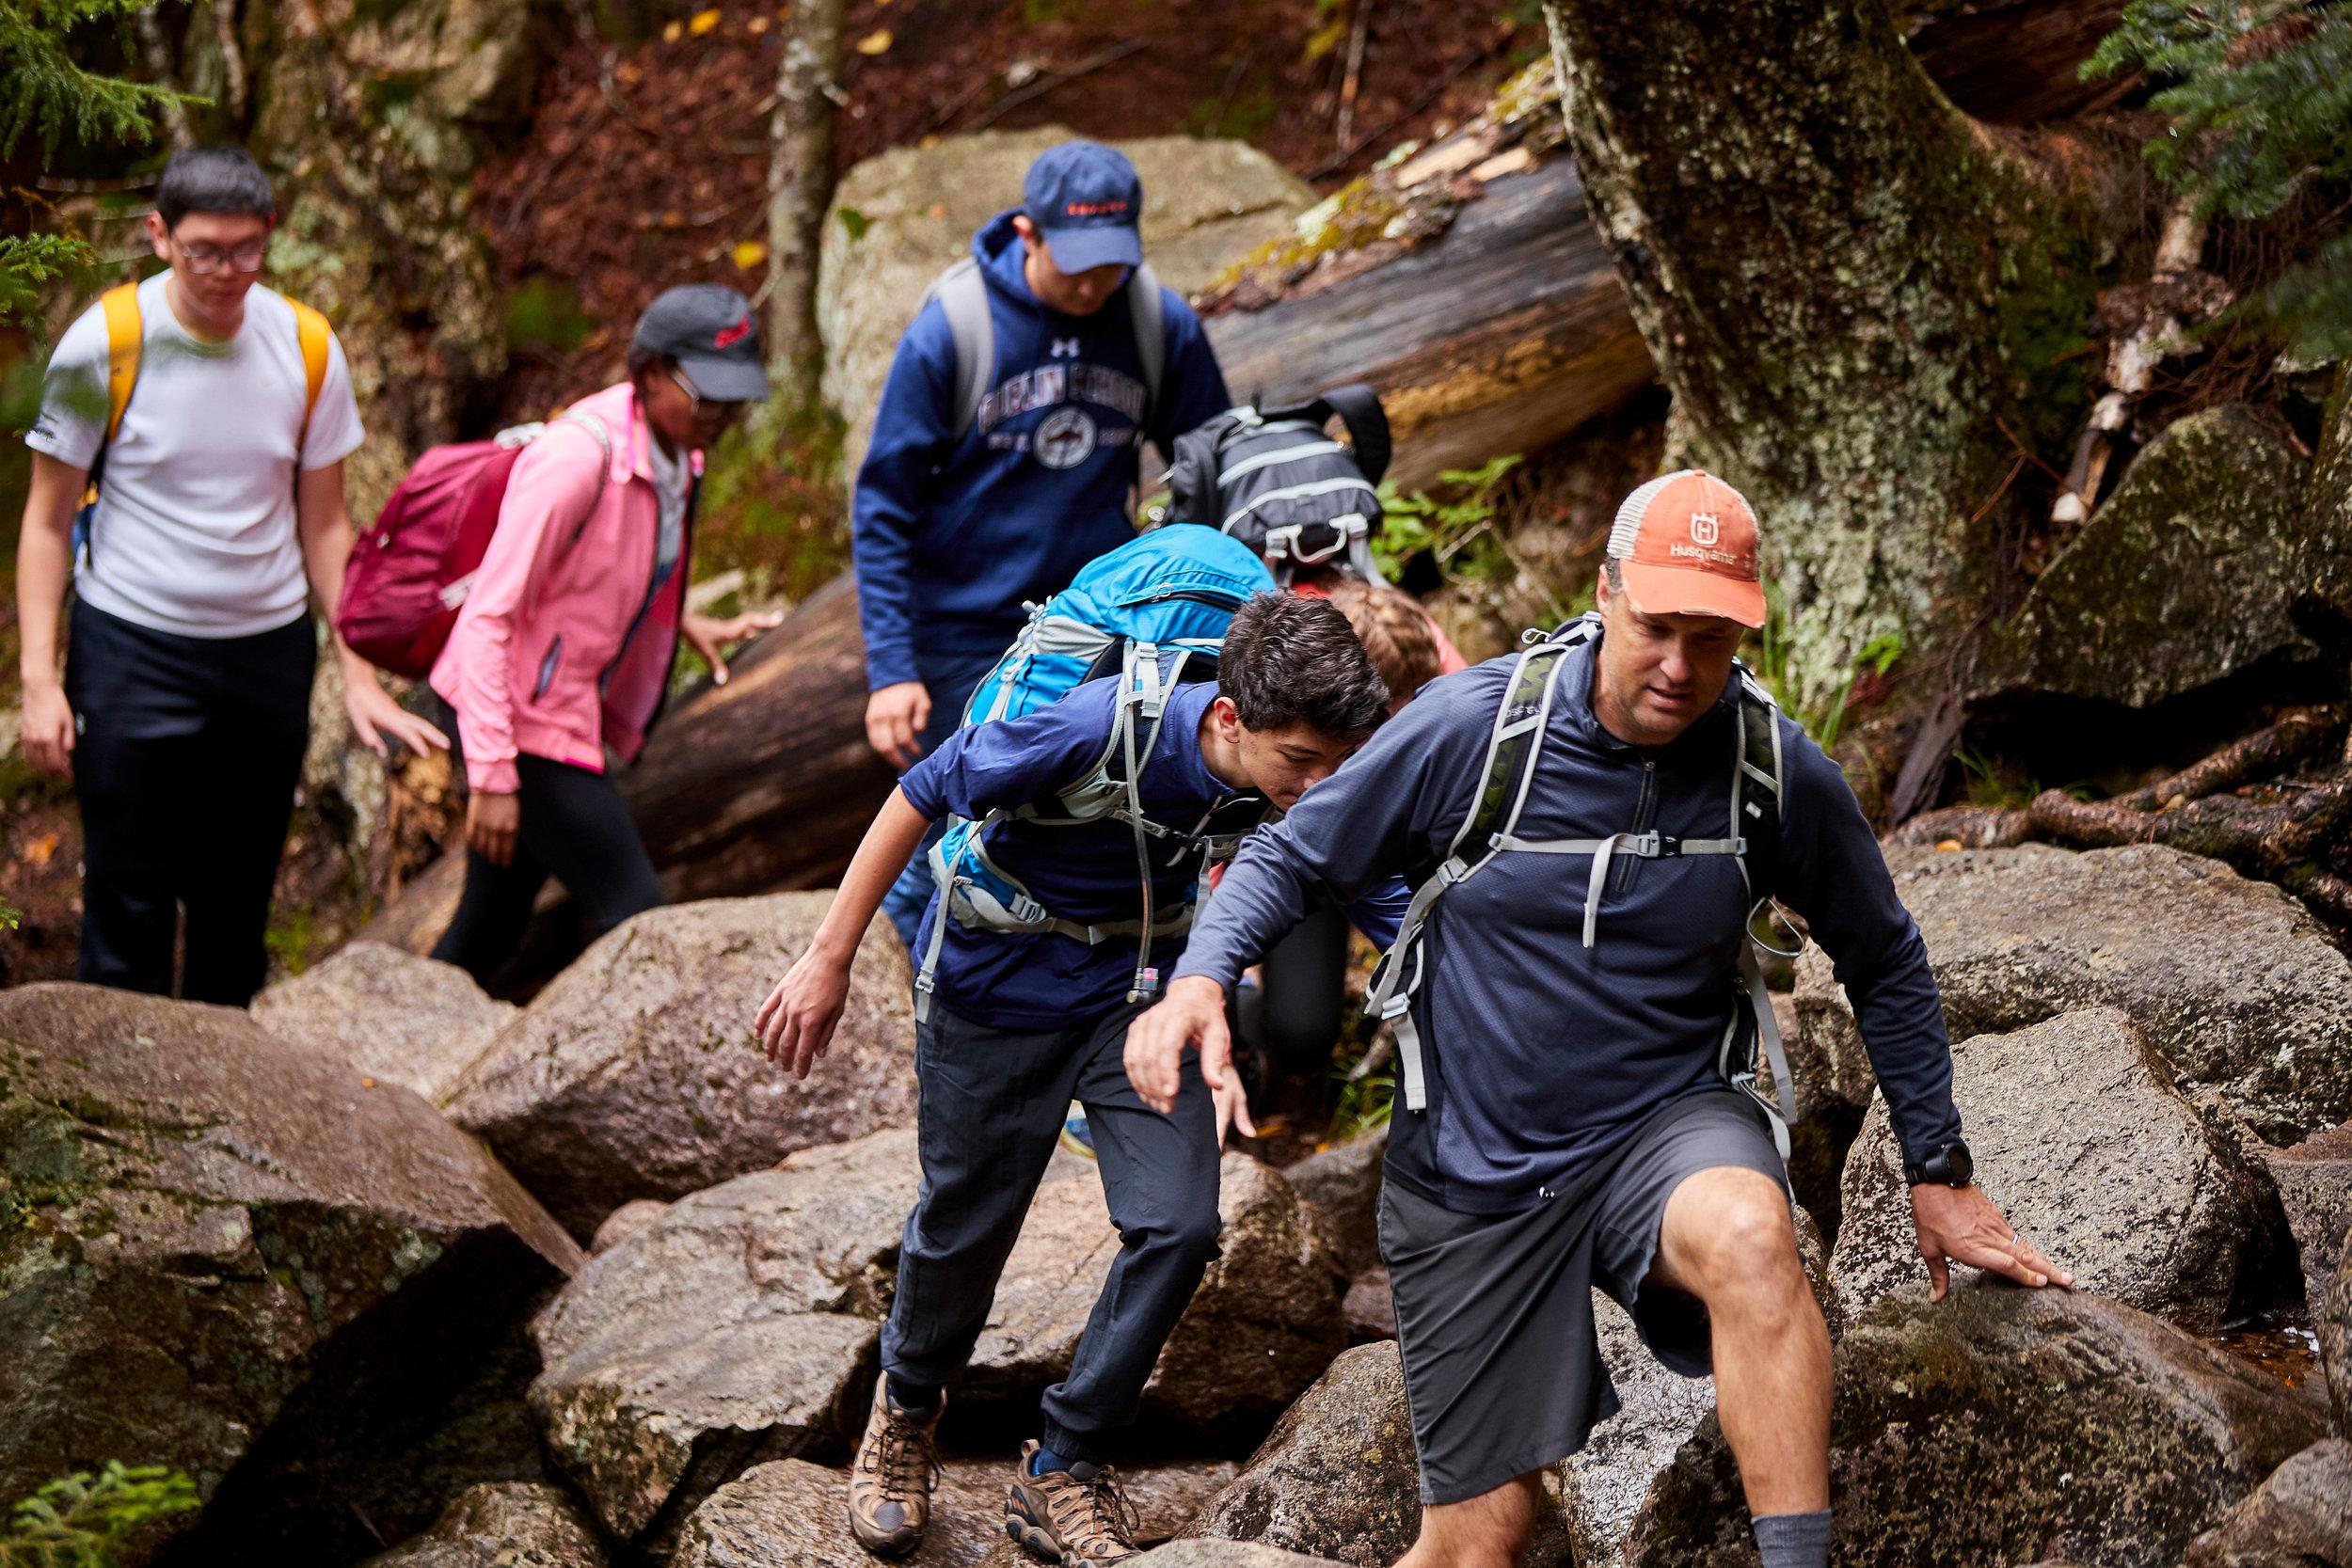 Camping trips 2017 - Sep 07 2017 -022-4K.jpg